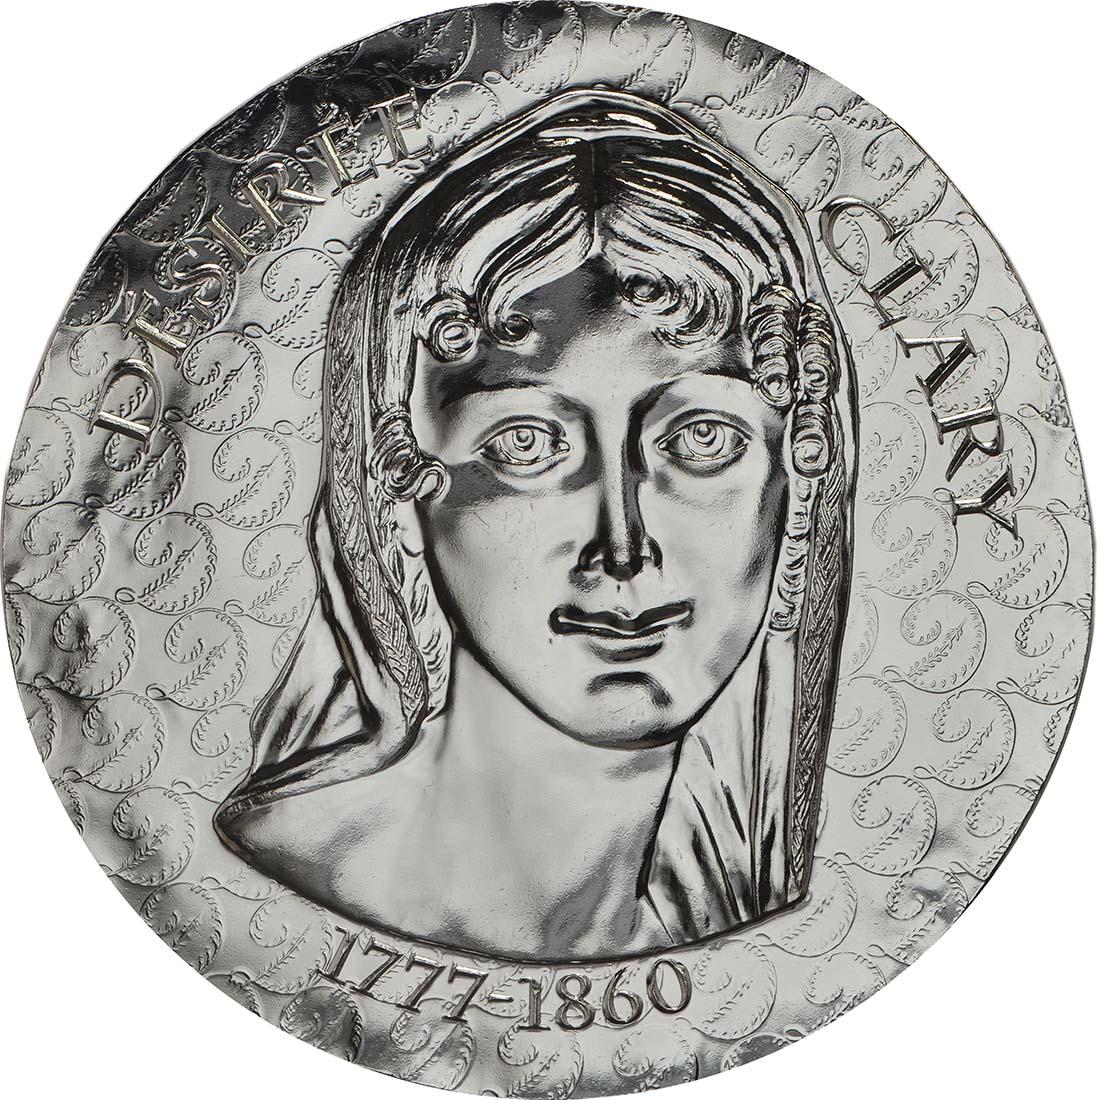 Vorderseite :Frankreich : 10 Euro Désirée Clary  2018 PP